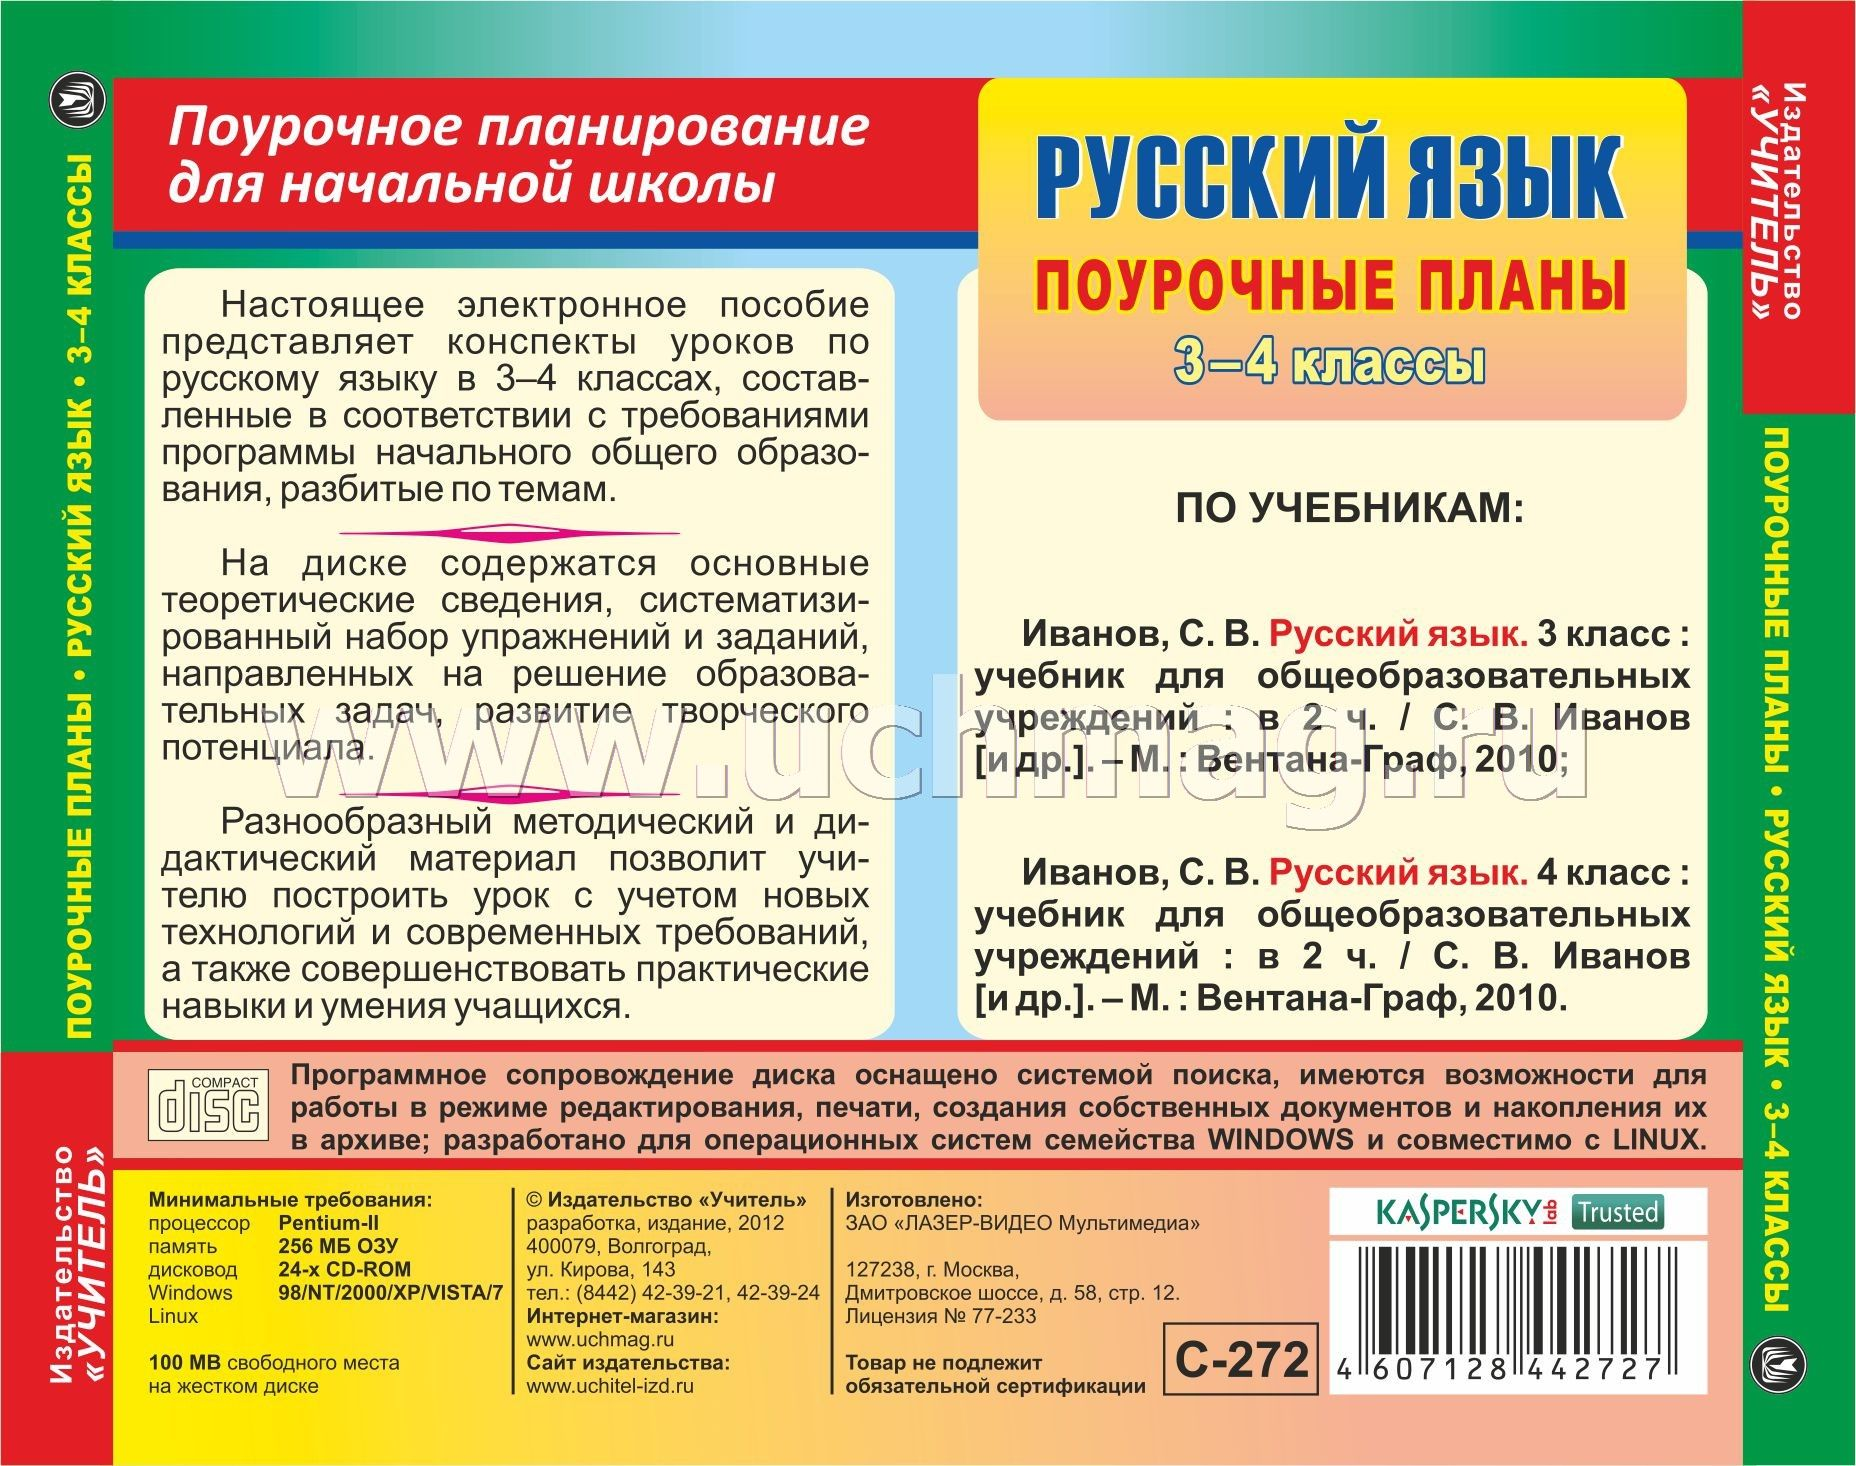 Диктанты по русскому языку нач шк 21 века 3 класс